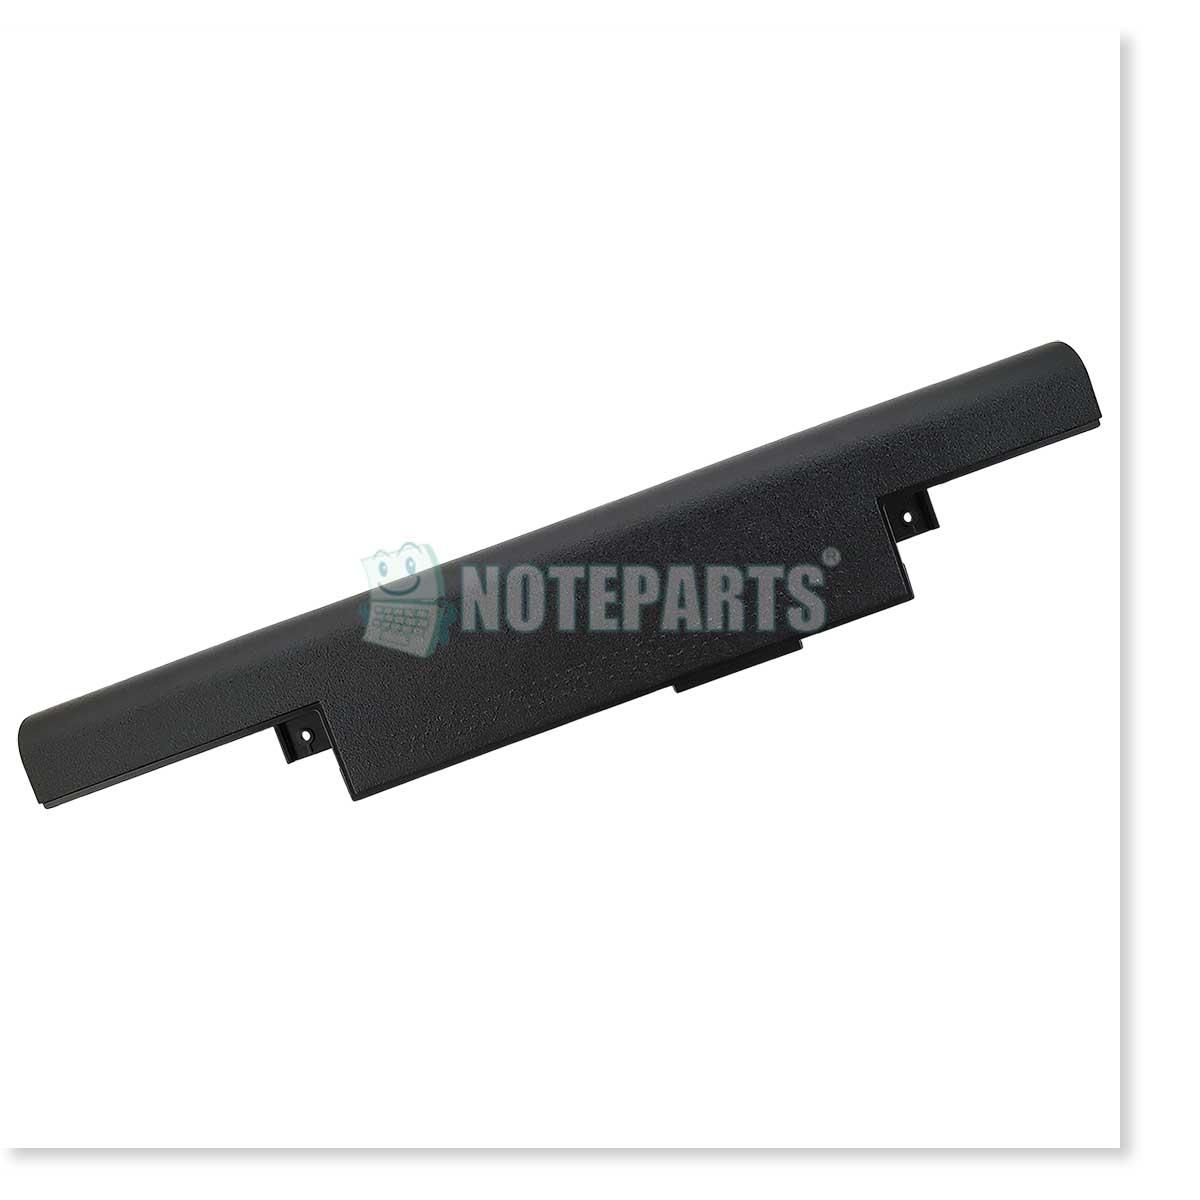 Dospara ドスパラ Critea クリテア VF-AG VF-AG10 VF-AGK VF-HG VF-HG10 VF-HGK バッテリー A41-D17対応